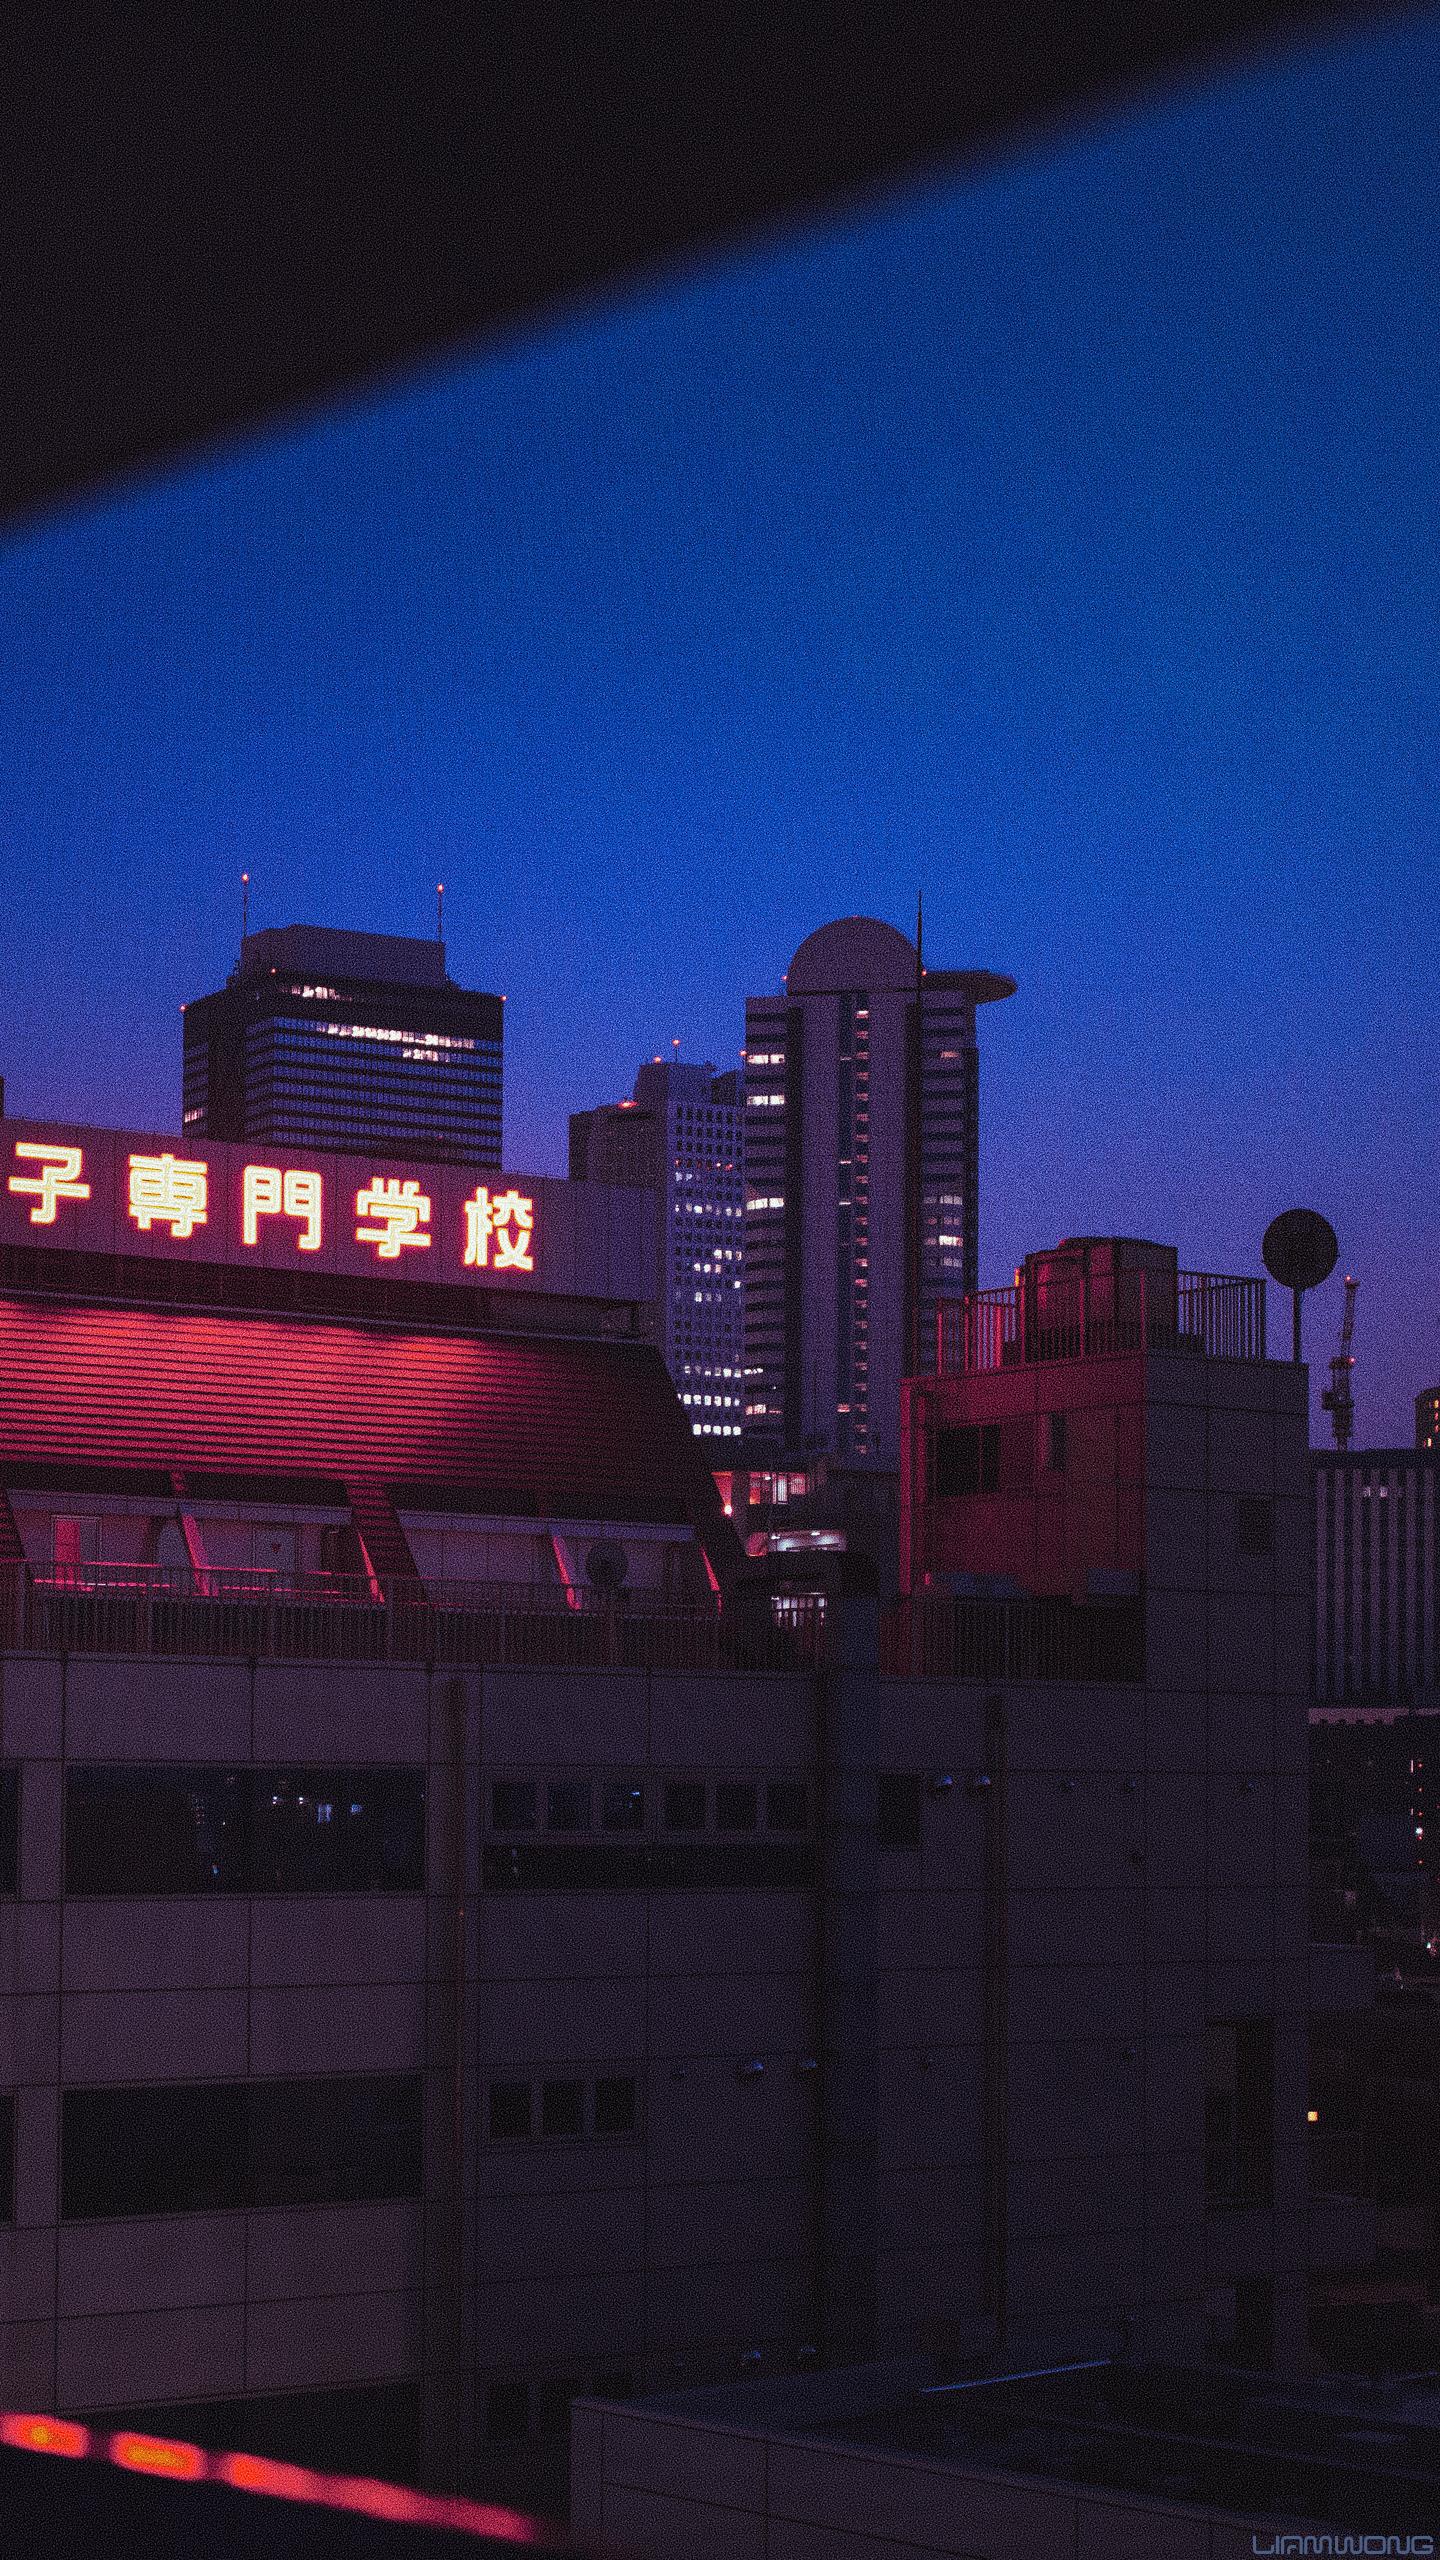 © Liam Wong - https://www.liamwong.com